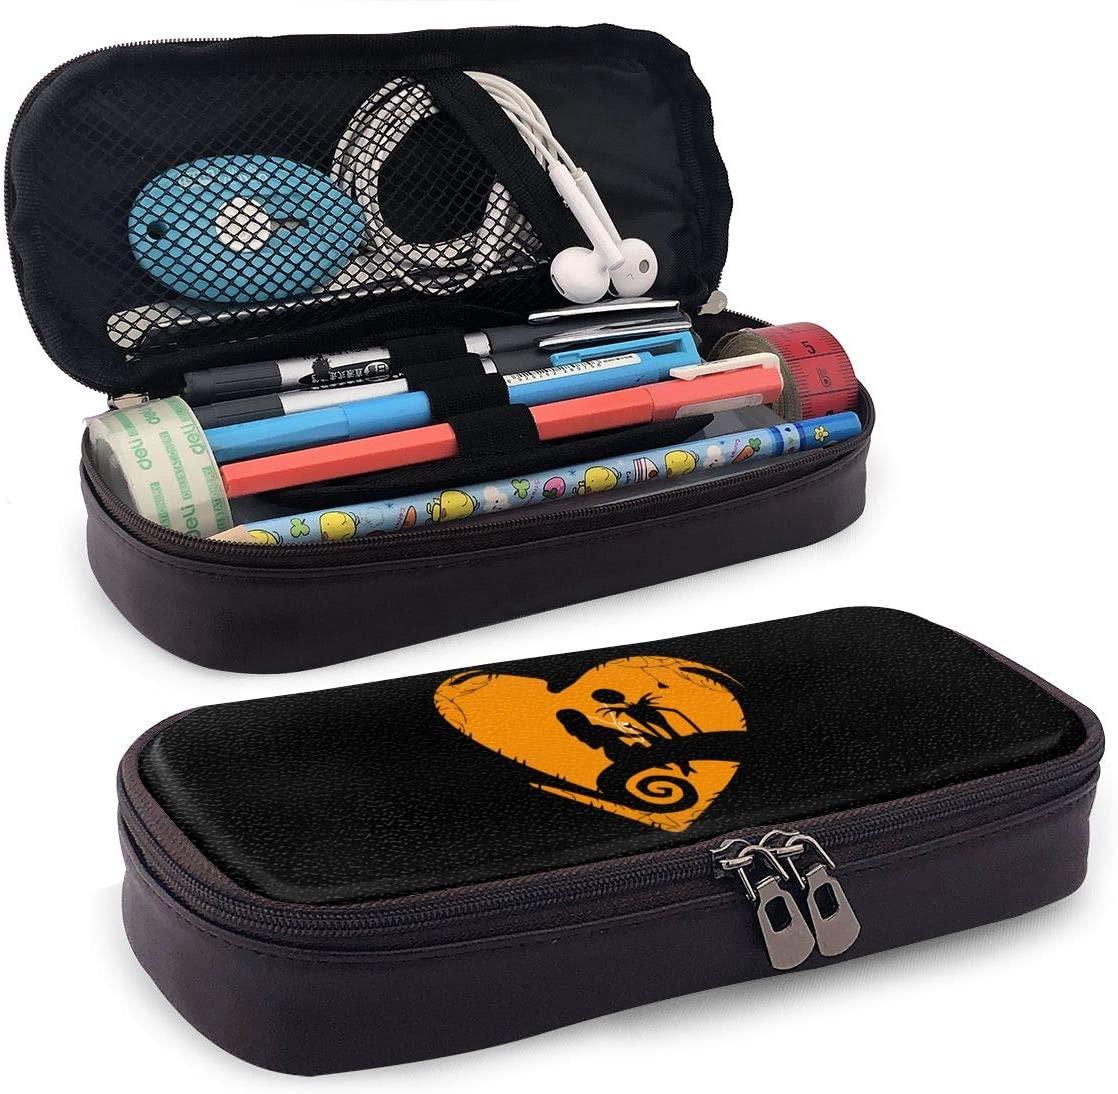 The Nightmare Before Christmas Teenager Pencil Bag, Small Tool Bag, Cosmetic Bag, Multi-Purpose Bag